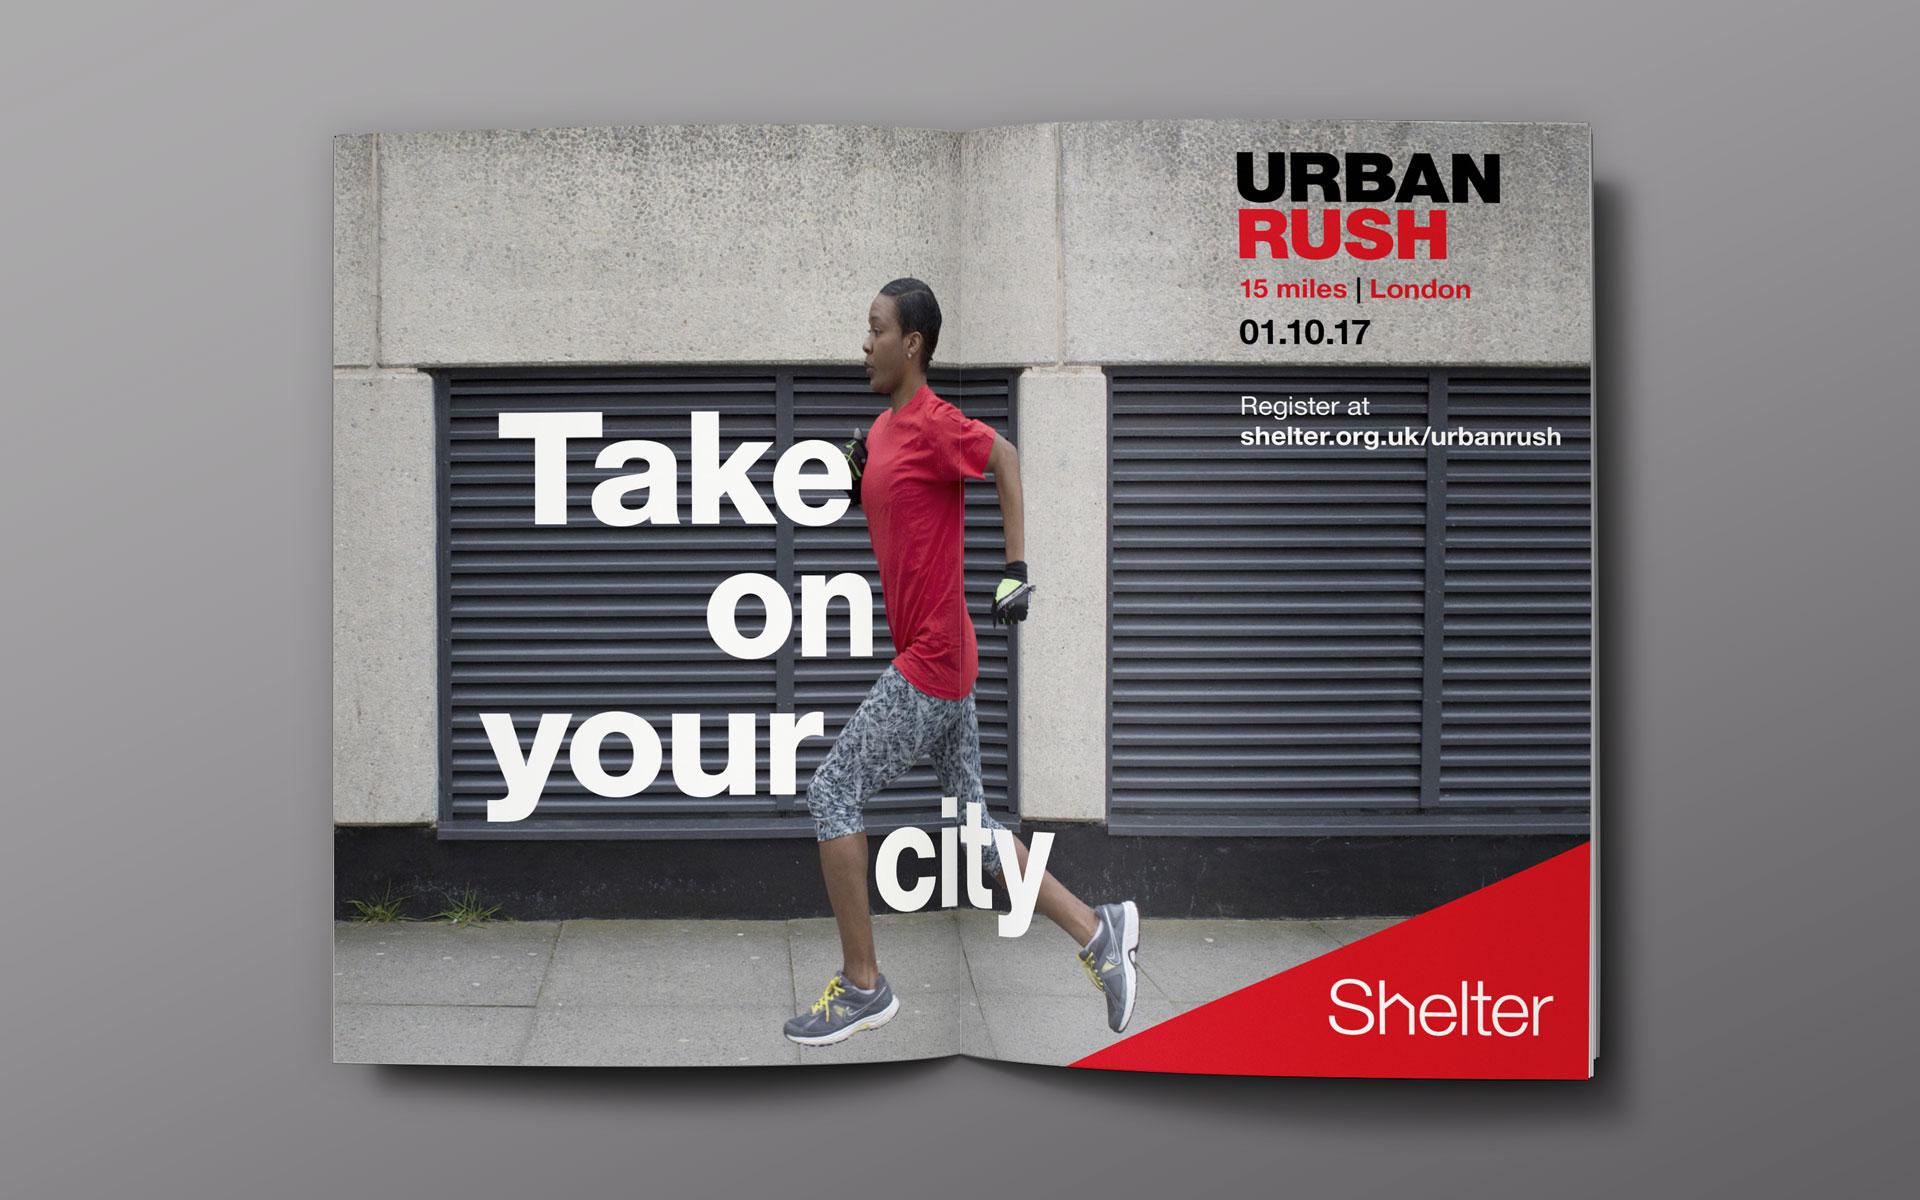 Shelter-Rush_image2